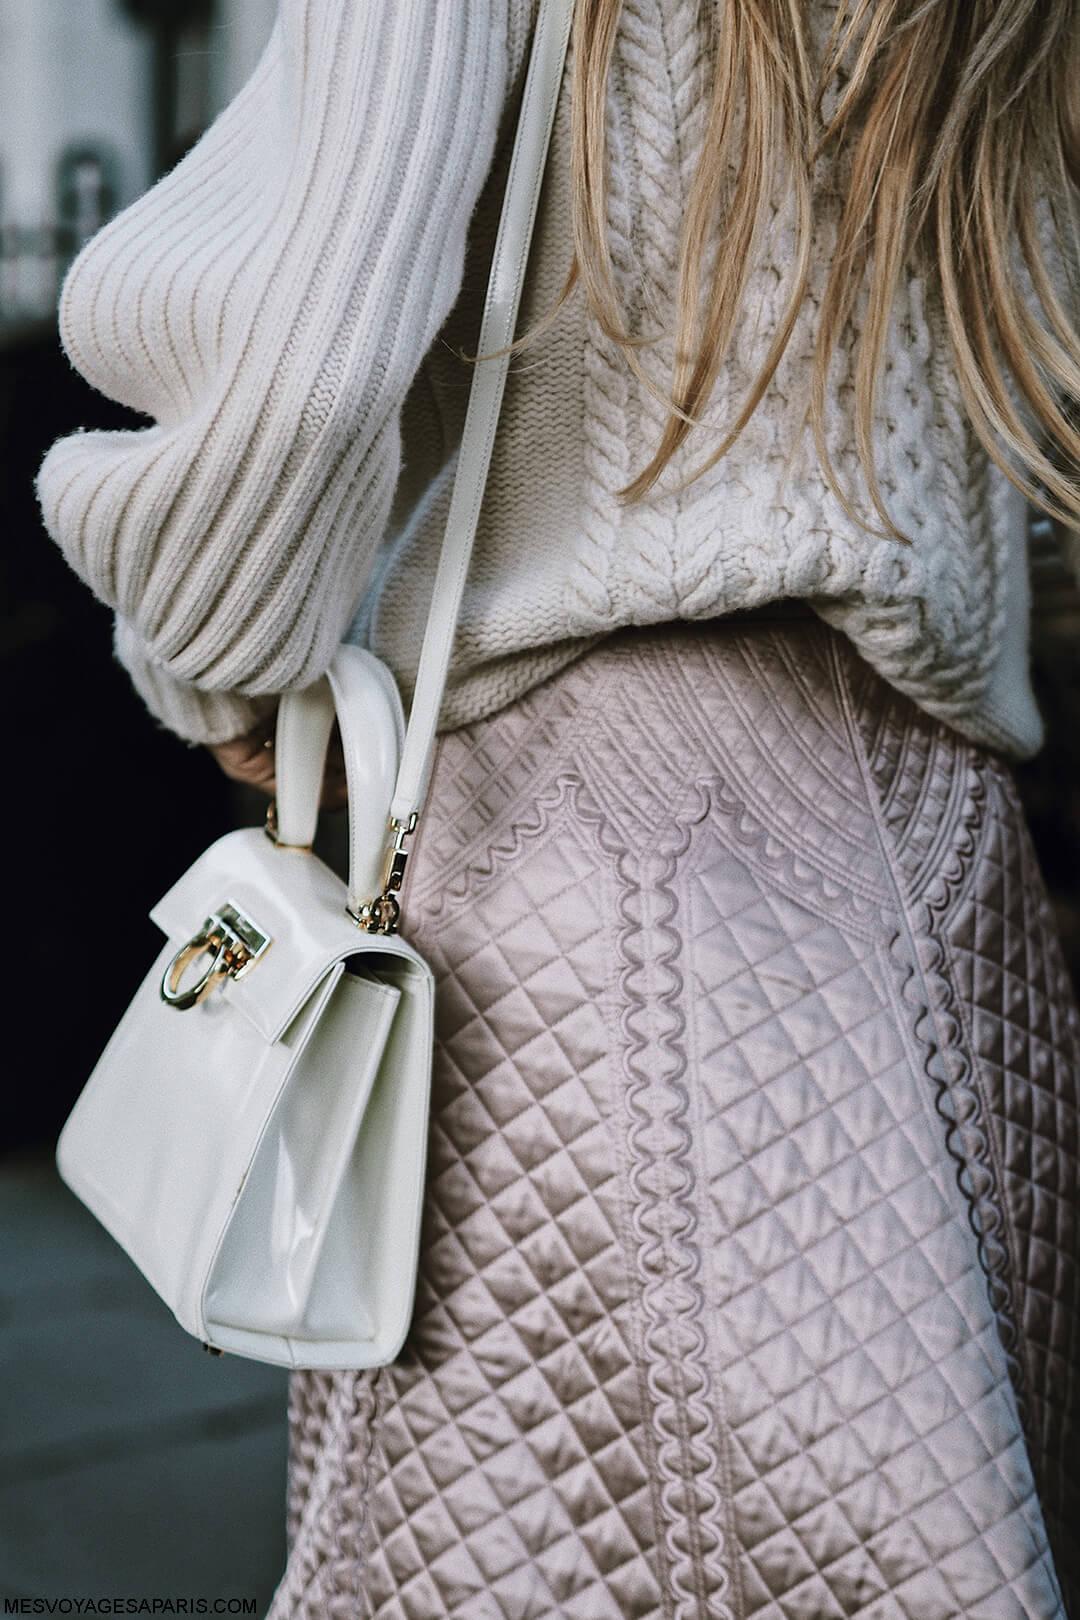 LFW-Street-Style-September-2017-london-fashion-week-Erica-Pelosini